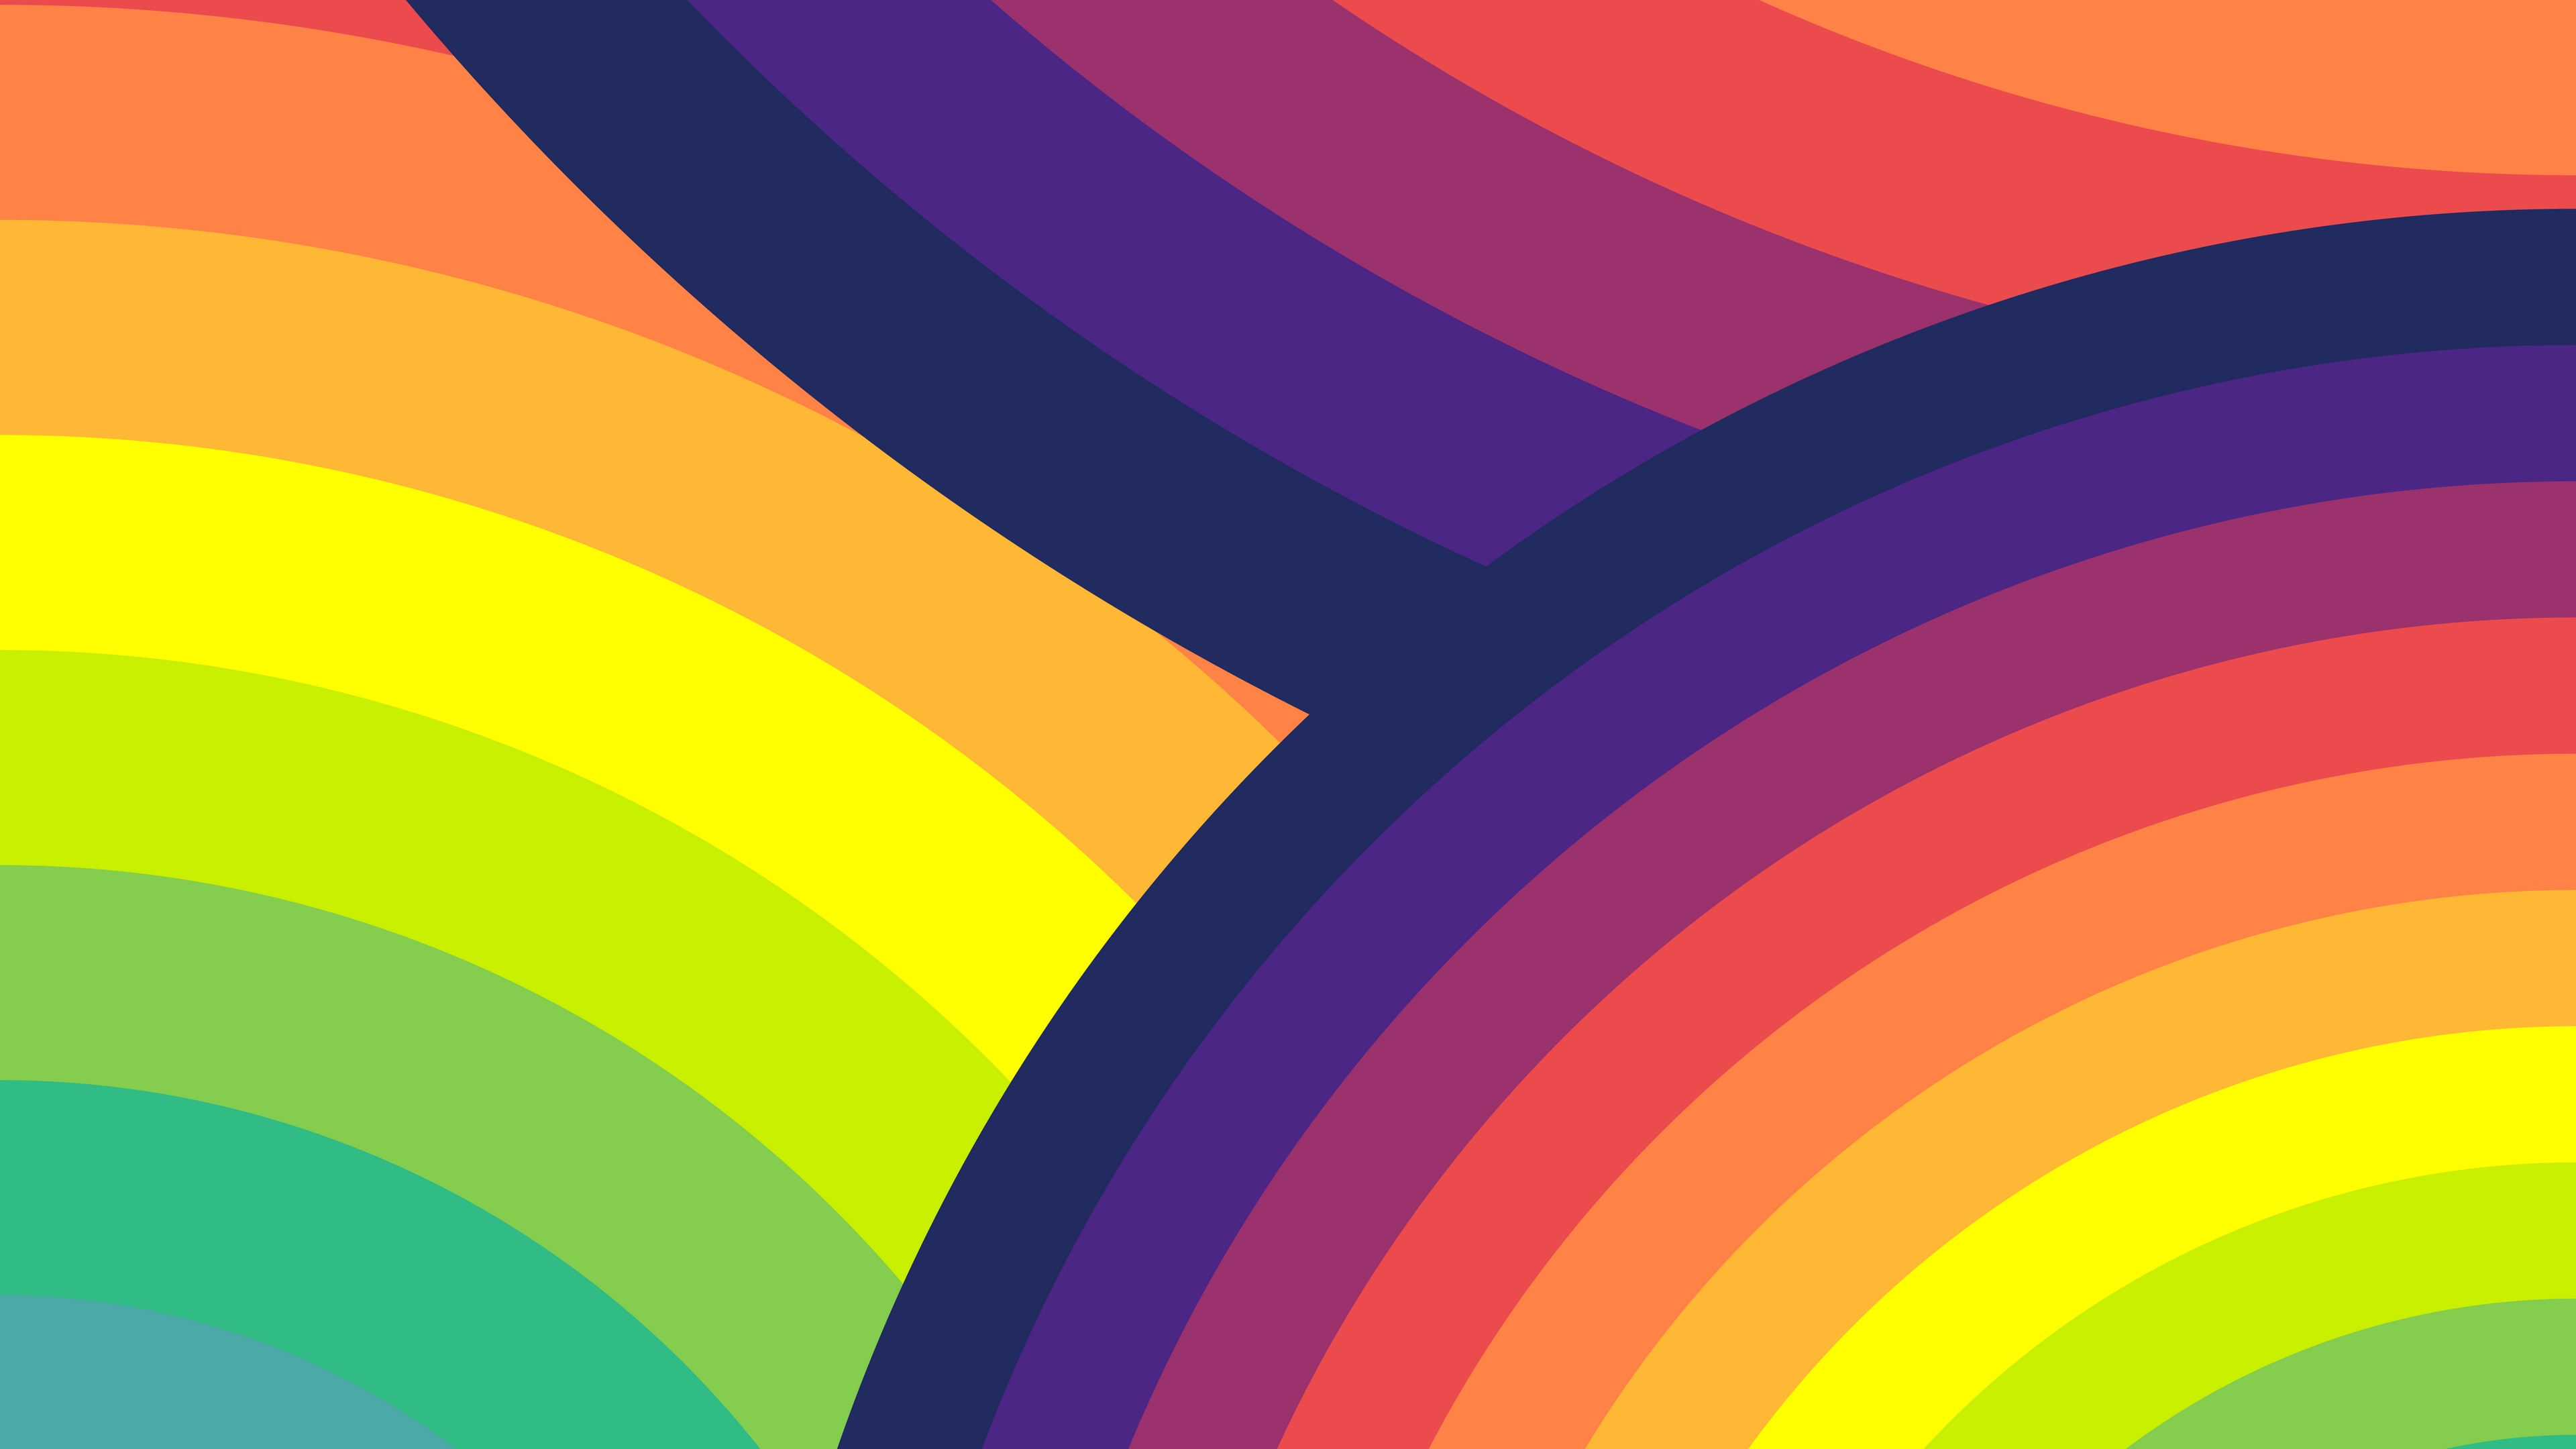 Wallpaper Circles Colorful Rainbow Arc Rainbow Wallpaper Hd 3840x2160 Wallpaper Teahub Io